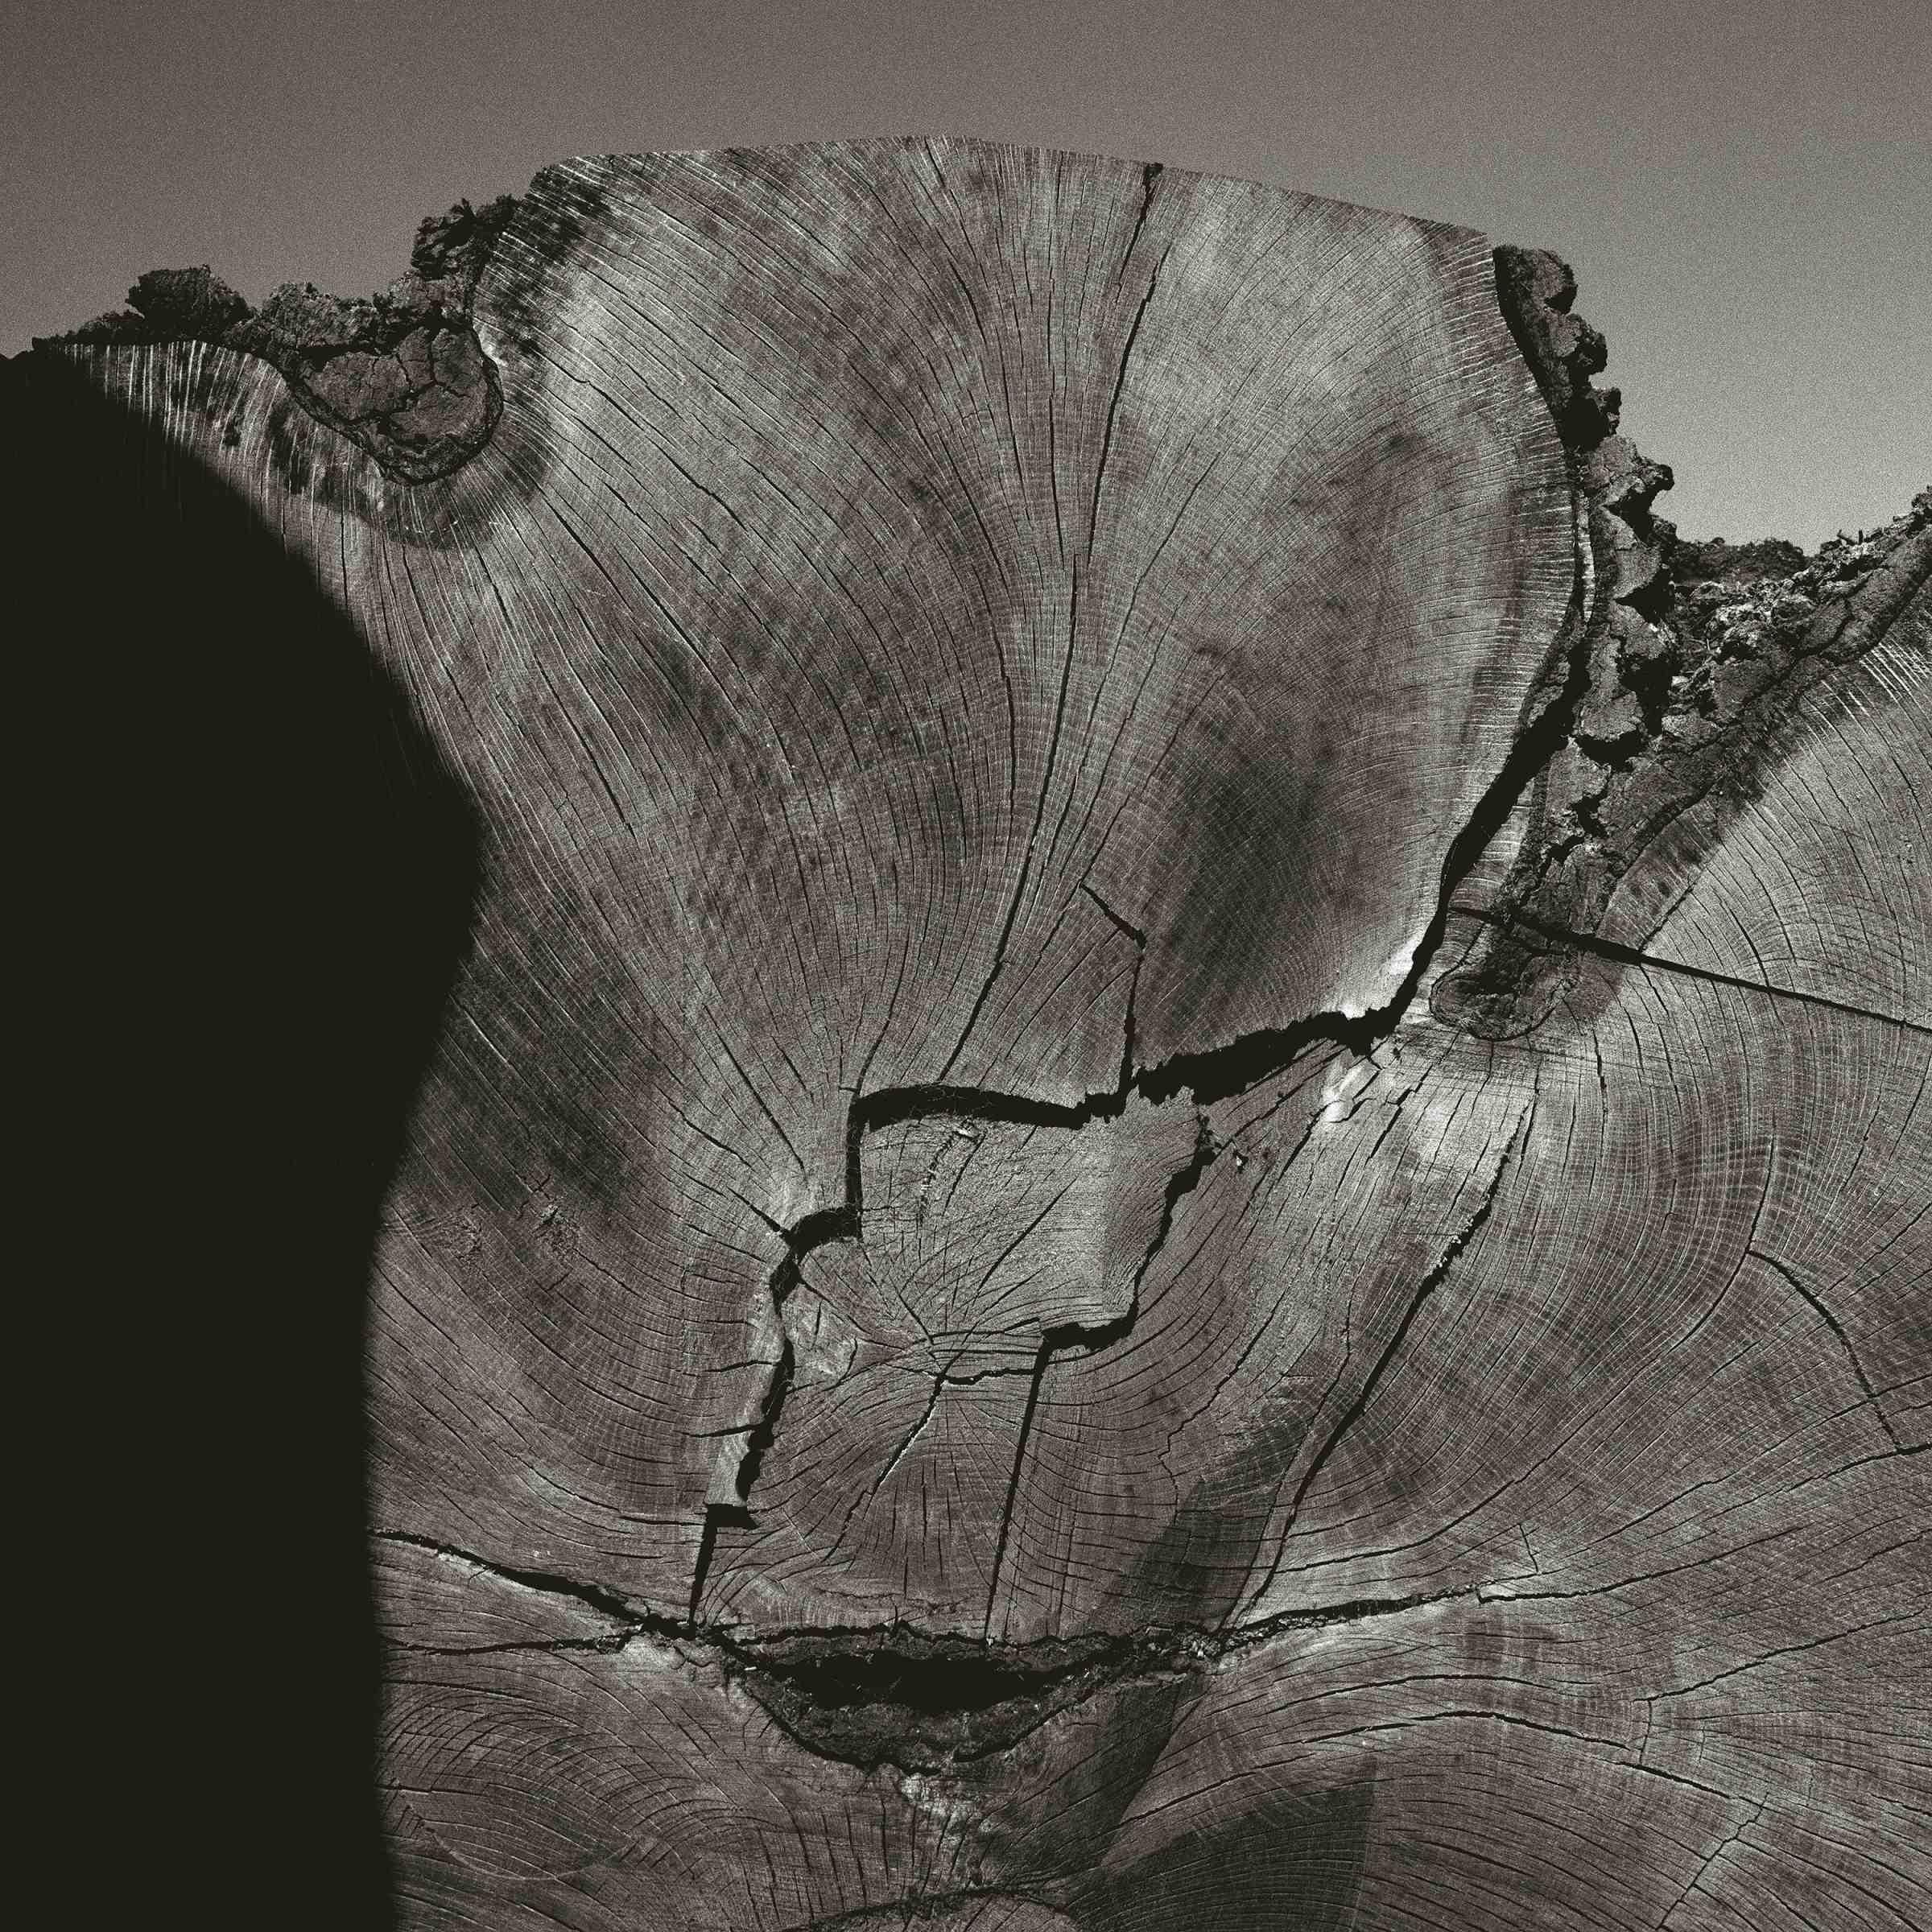 Wood Iv Wiltshire 1995